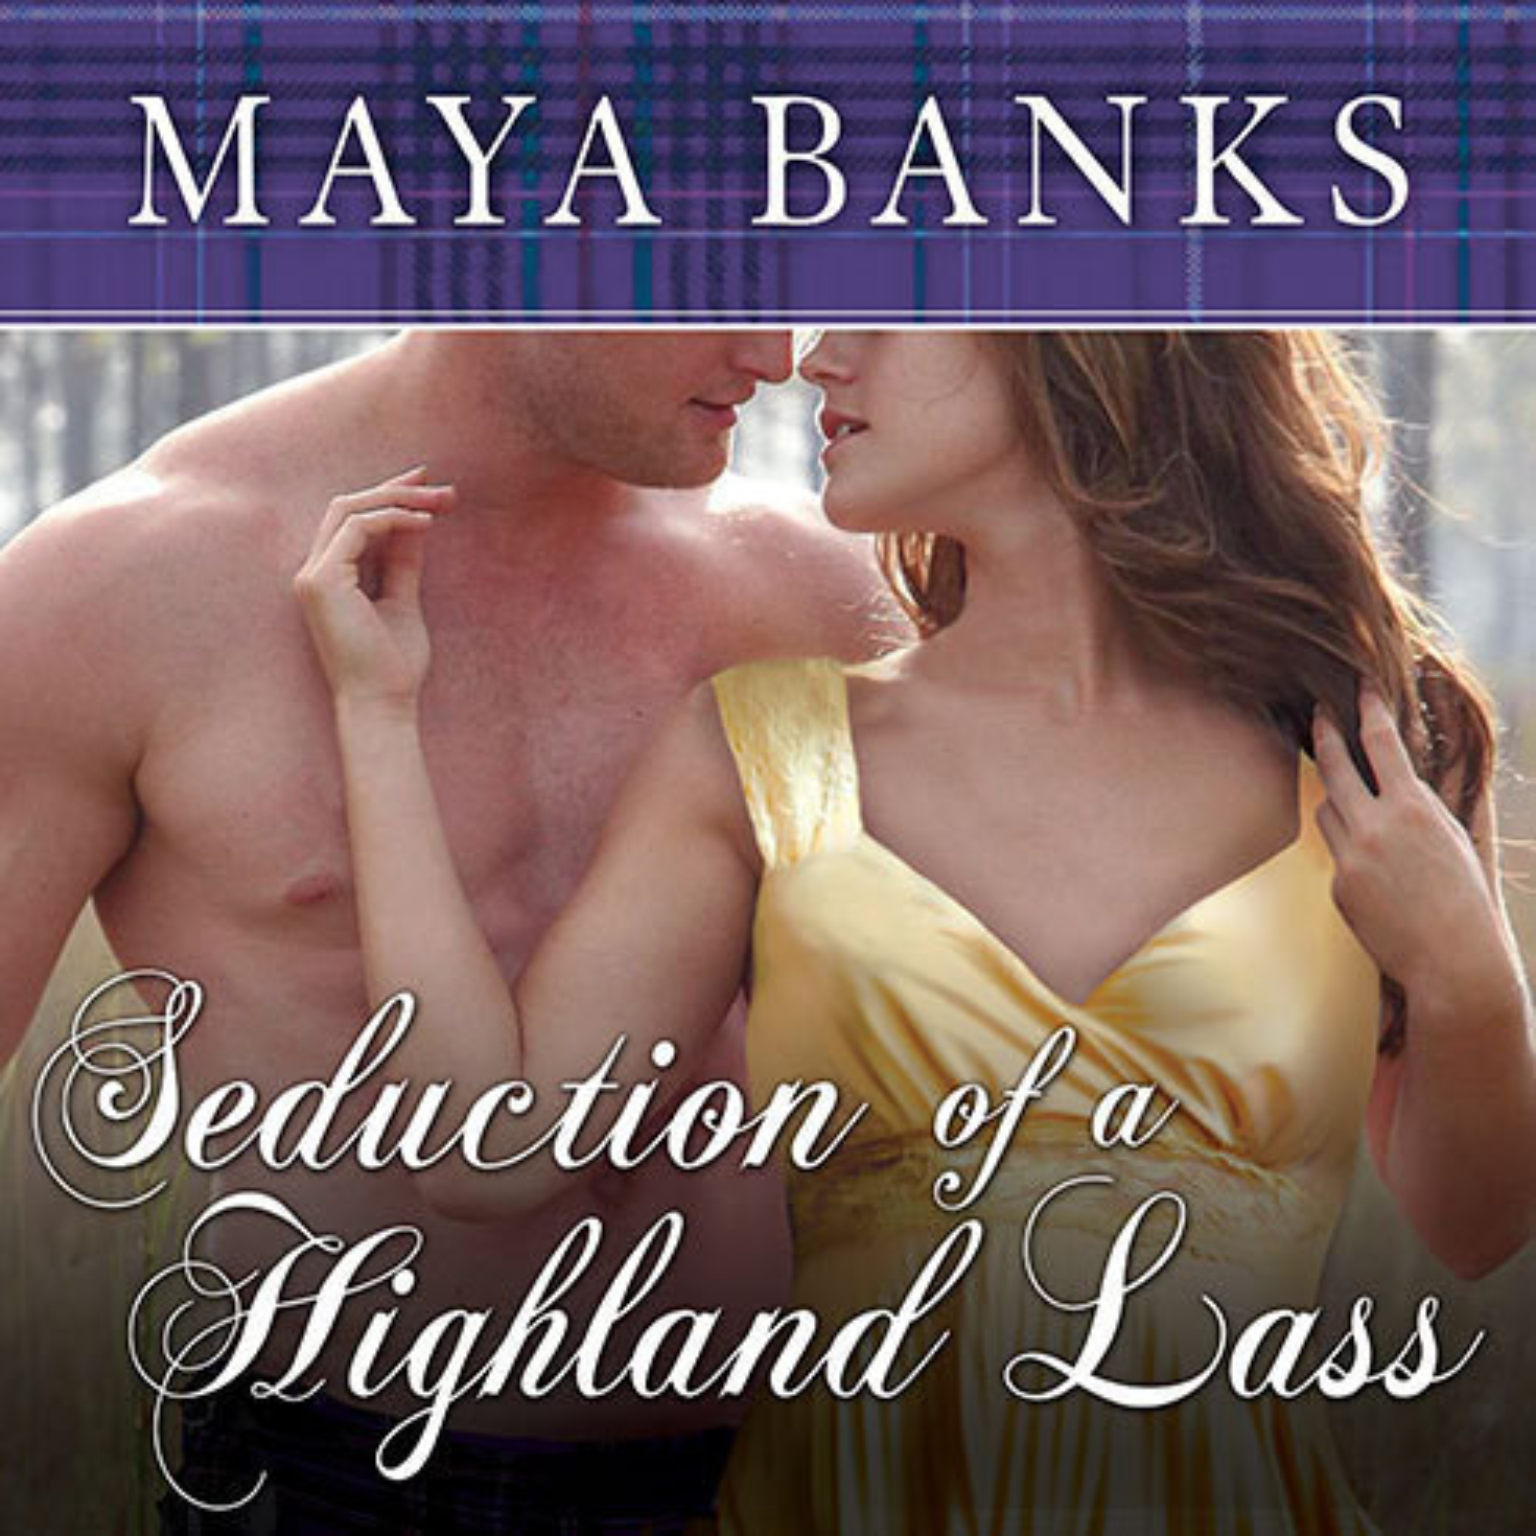 Seduction of a Highland Lass Audiobook, by Maya Banks